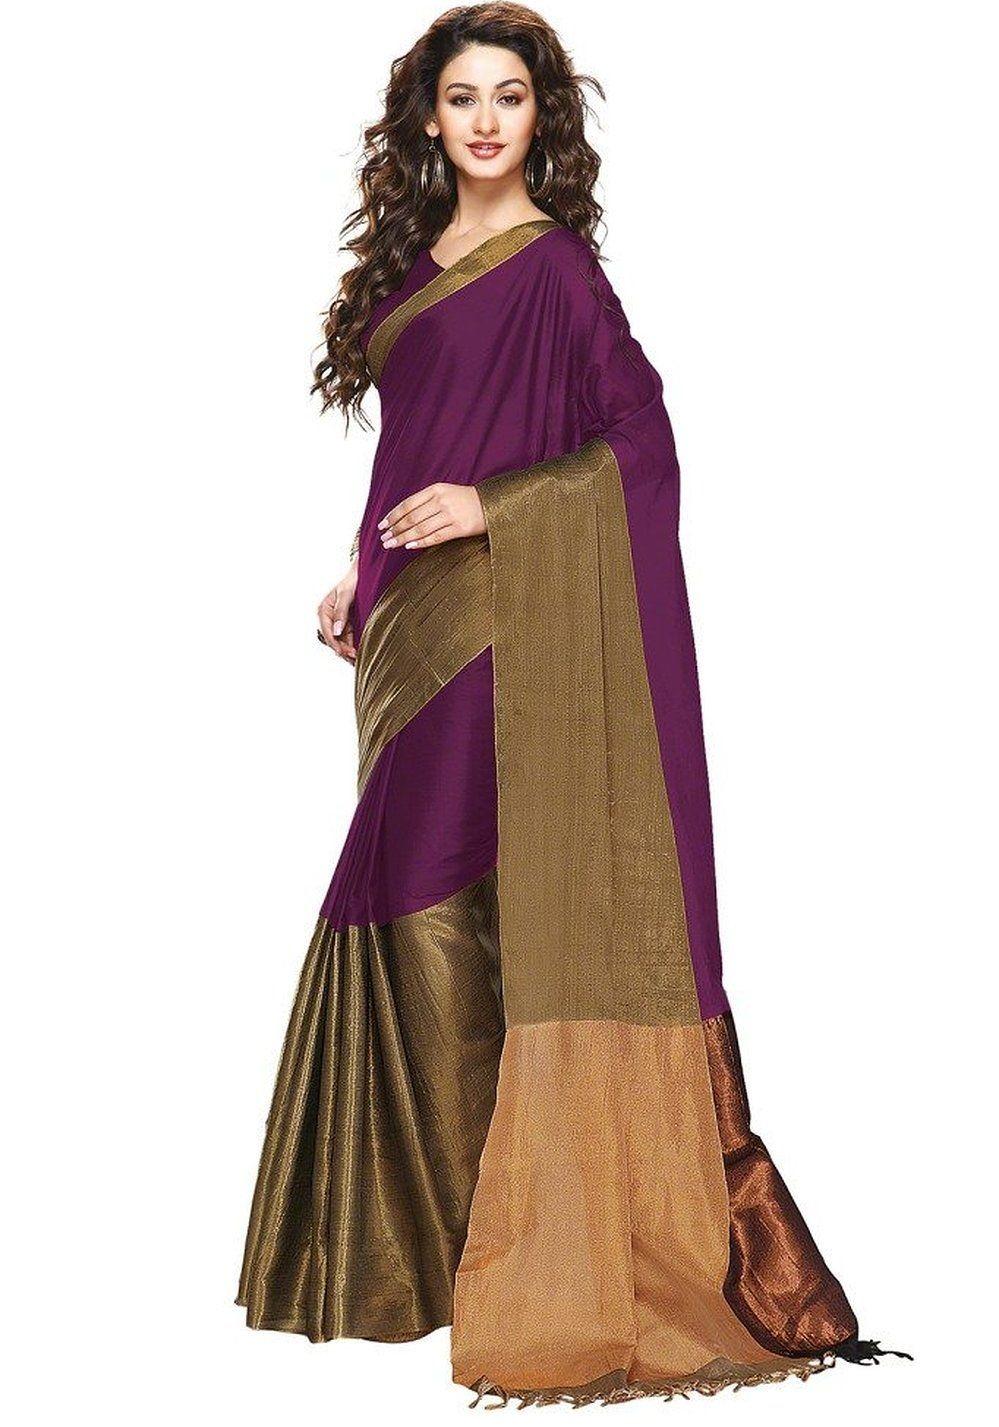 cb4cbf5dc8 Wine Color Cotton Silk Saree   Colorful Sarees   Designer silk ...